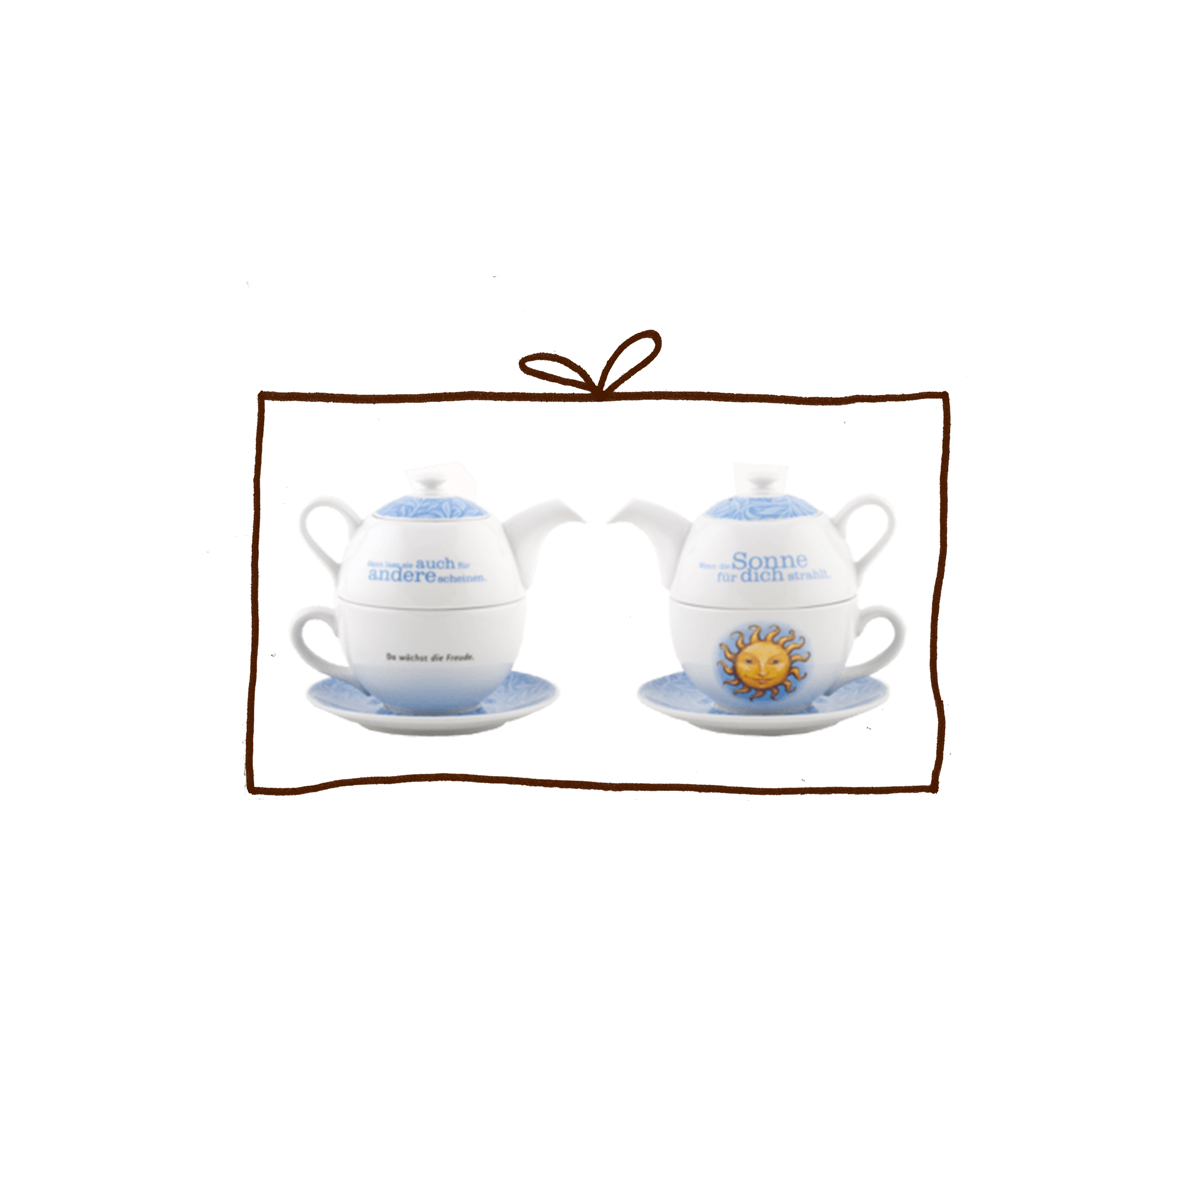 SONNENTOR Tea for one Set Kännchen & Tasse 500ml